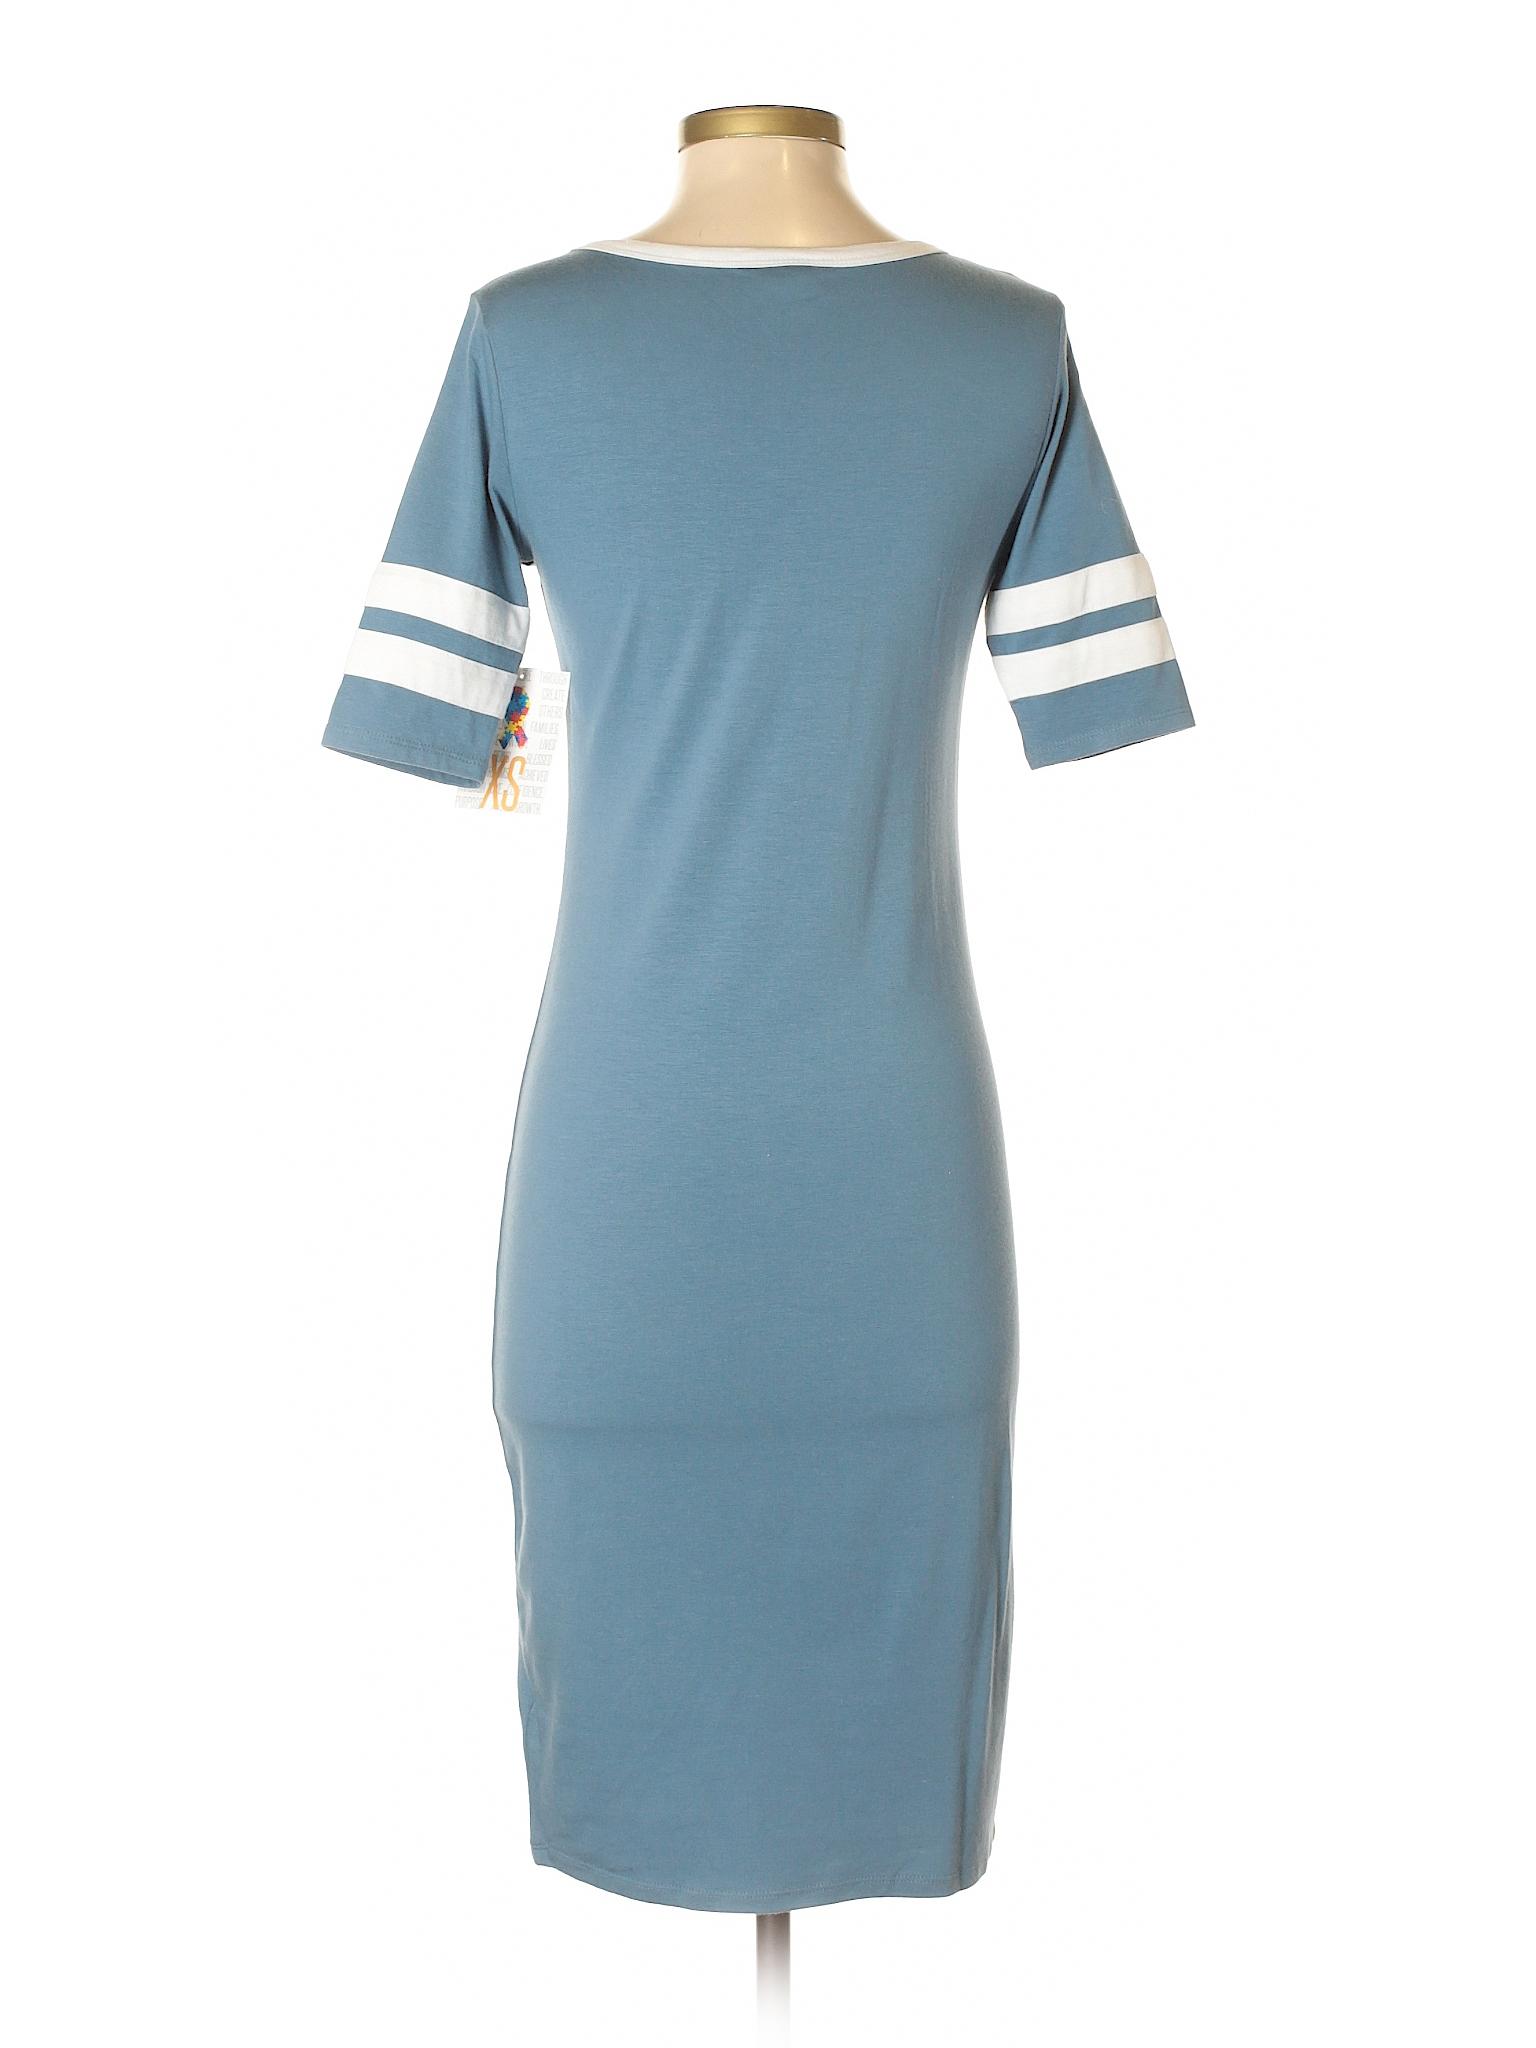 Dress Selling Lularoe Casual Casual Selling Dress Dress Lularoe Lularoe Selling Casual wY6qxH1B